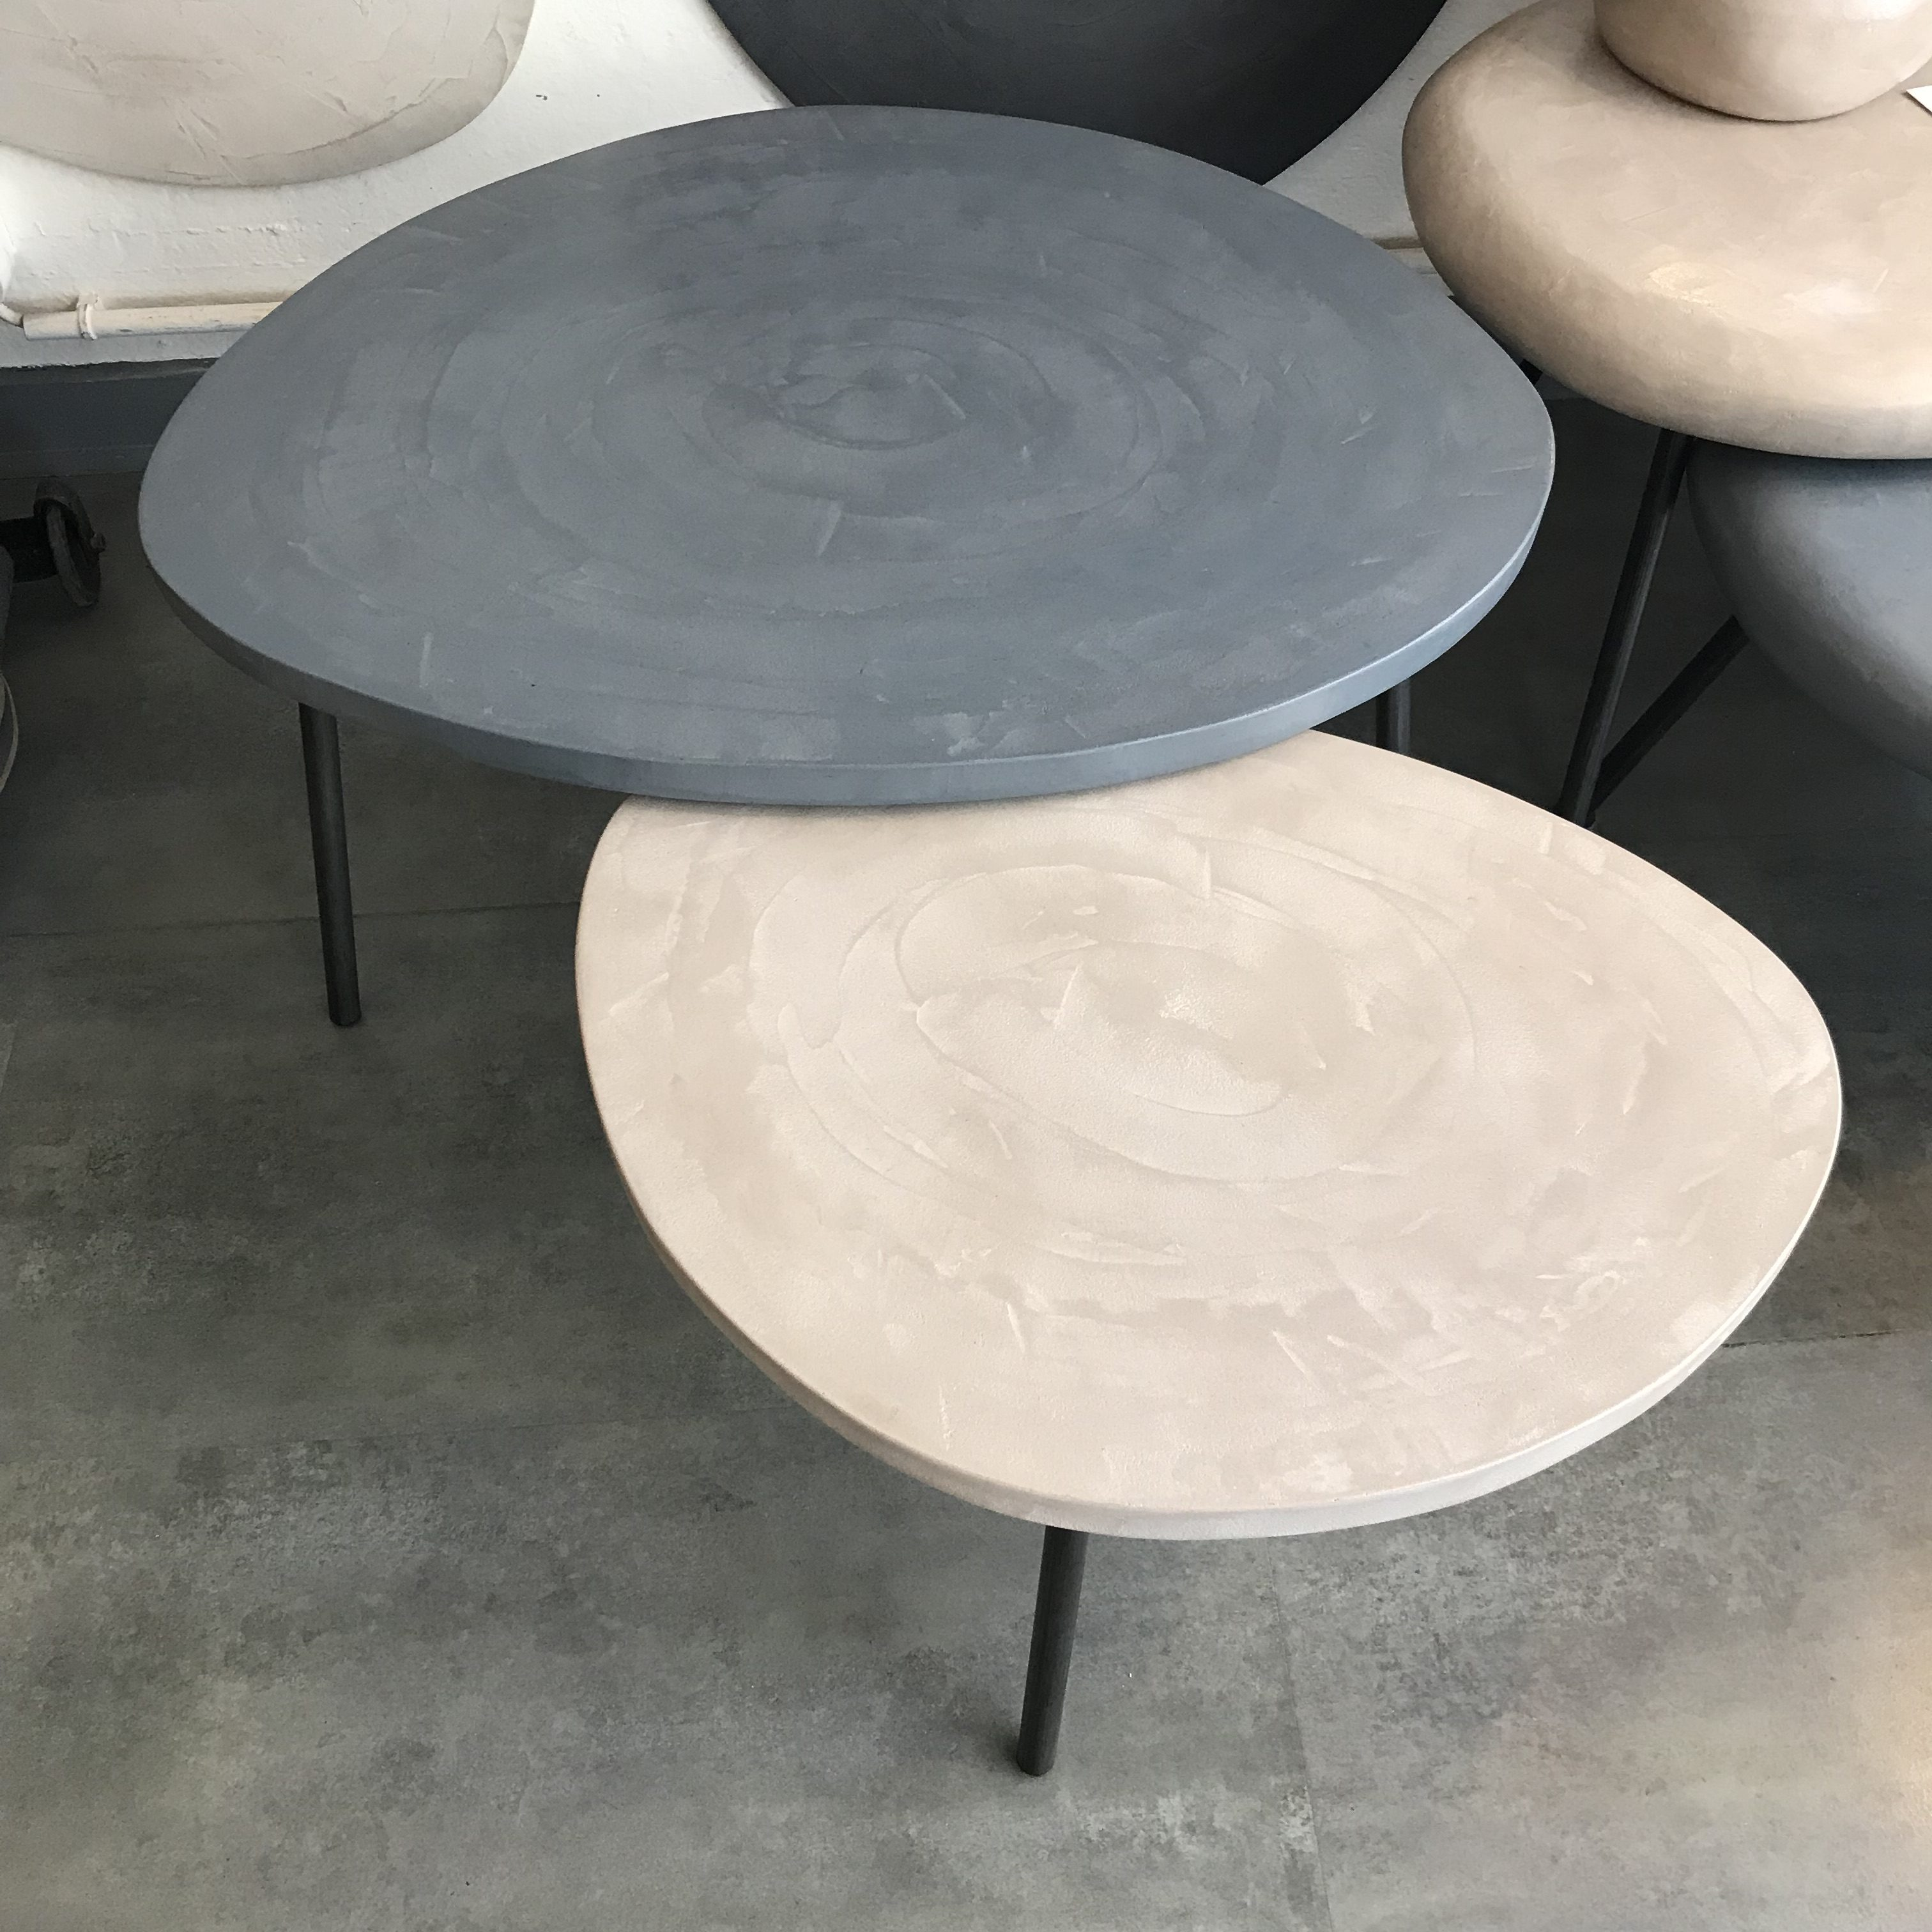 Béton Mesure Tables Sur Vm0wnon8 Basses Rugiada En Industriel Meubles XiZkTOPu